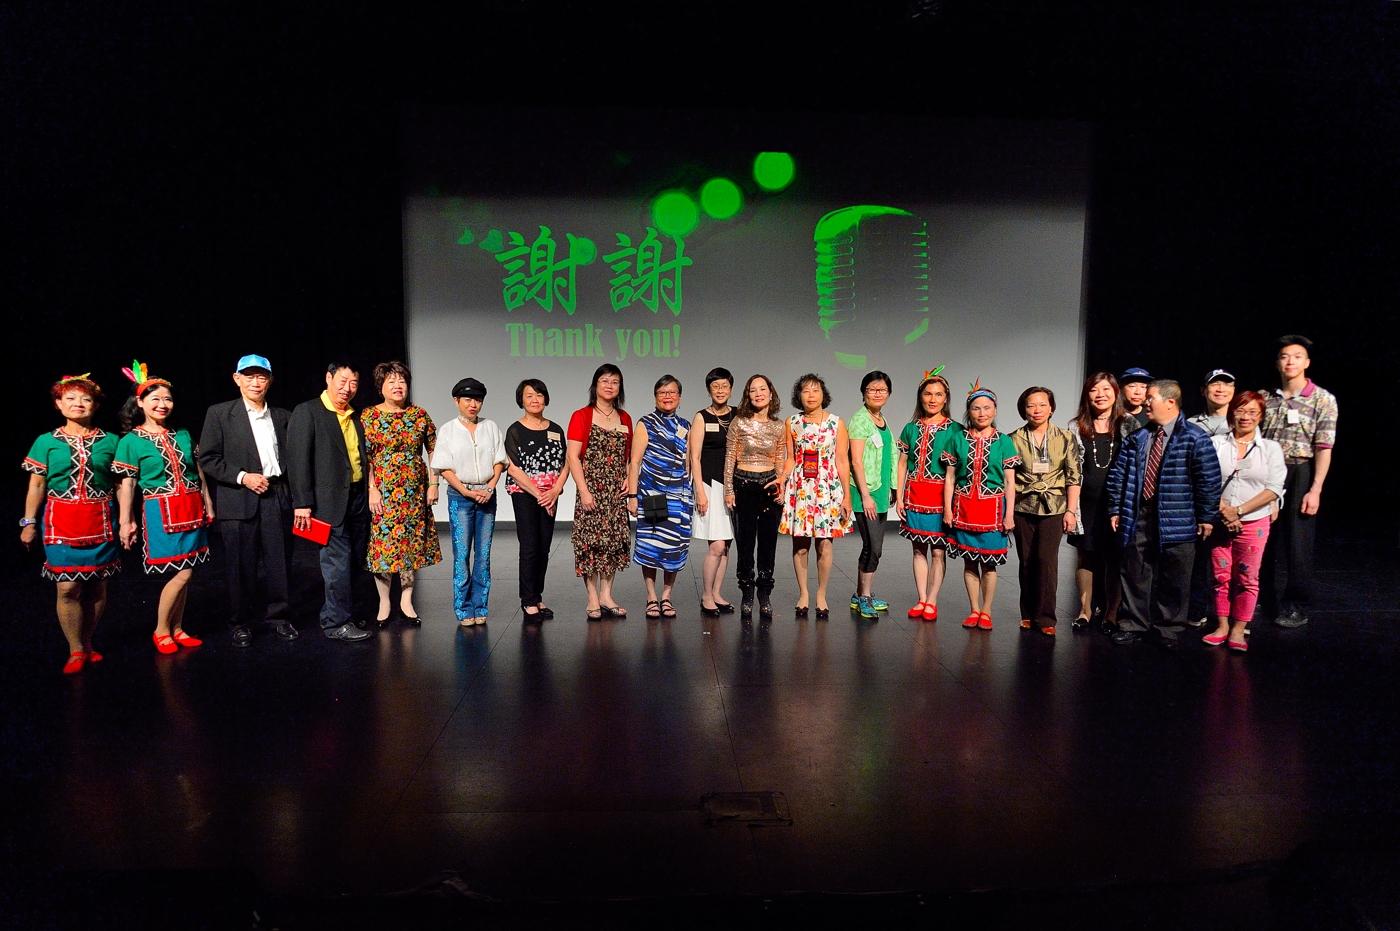 2017 Janny Yau Concert 邱寶玉演唱會